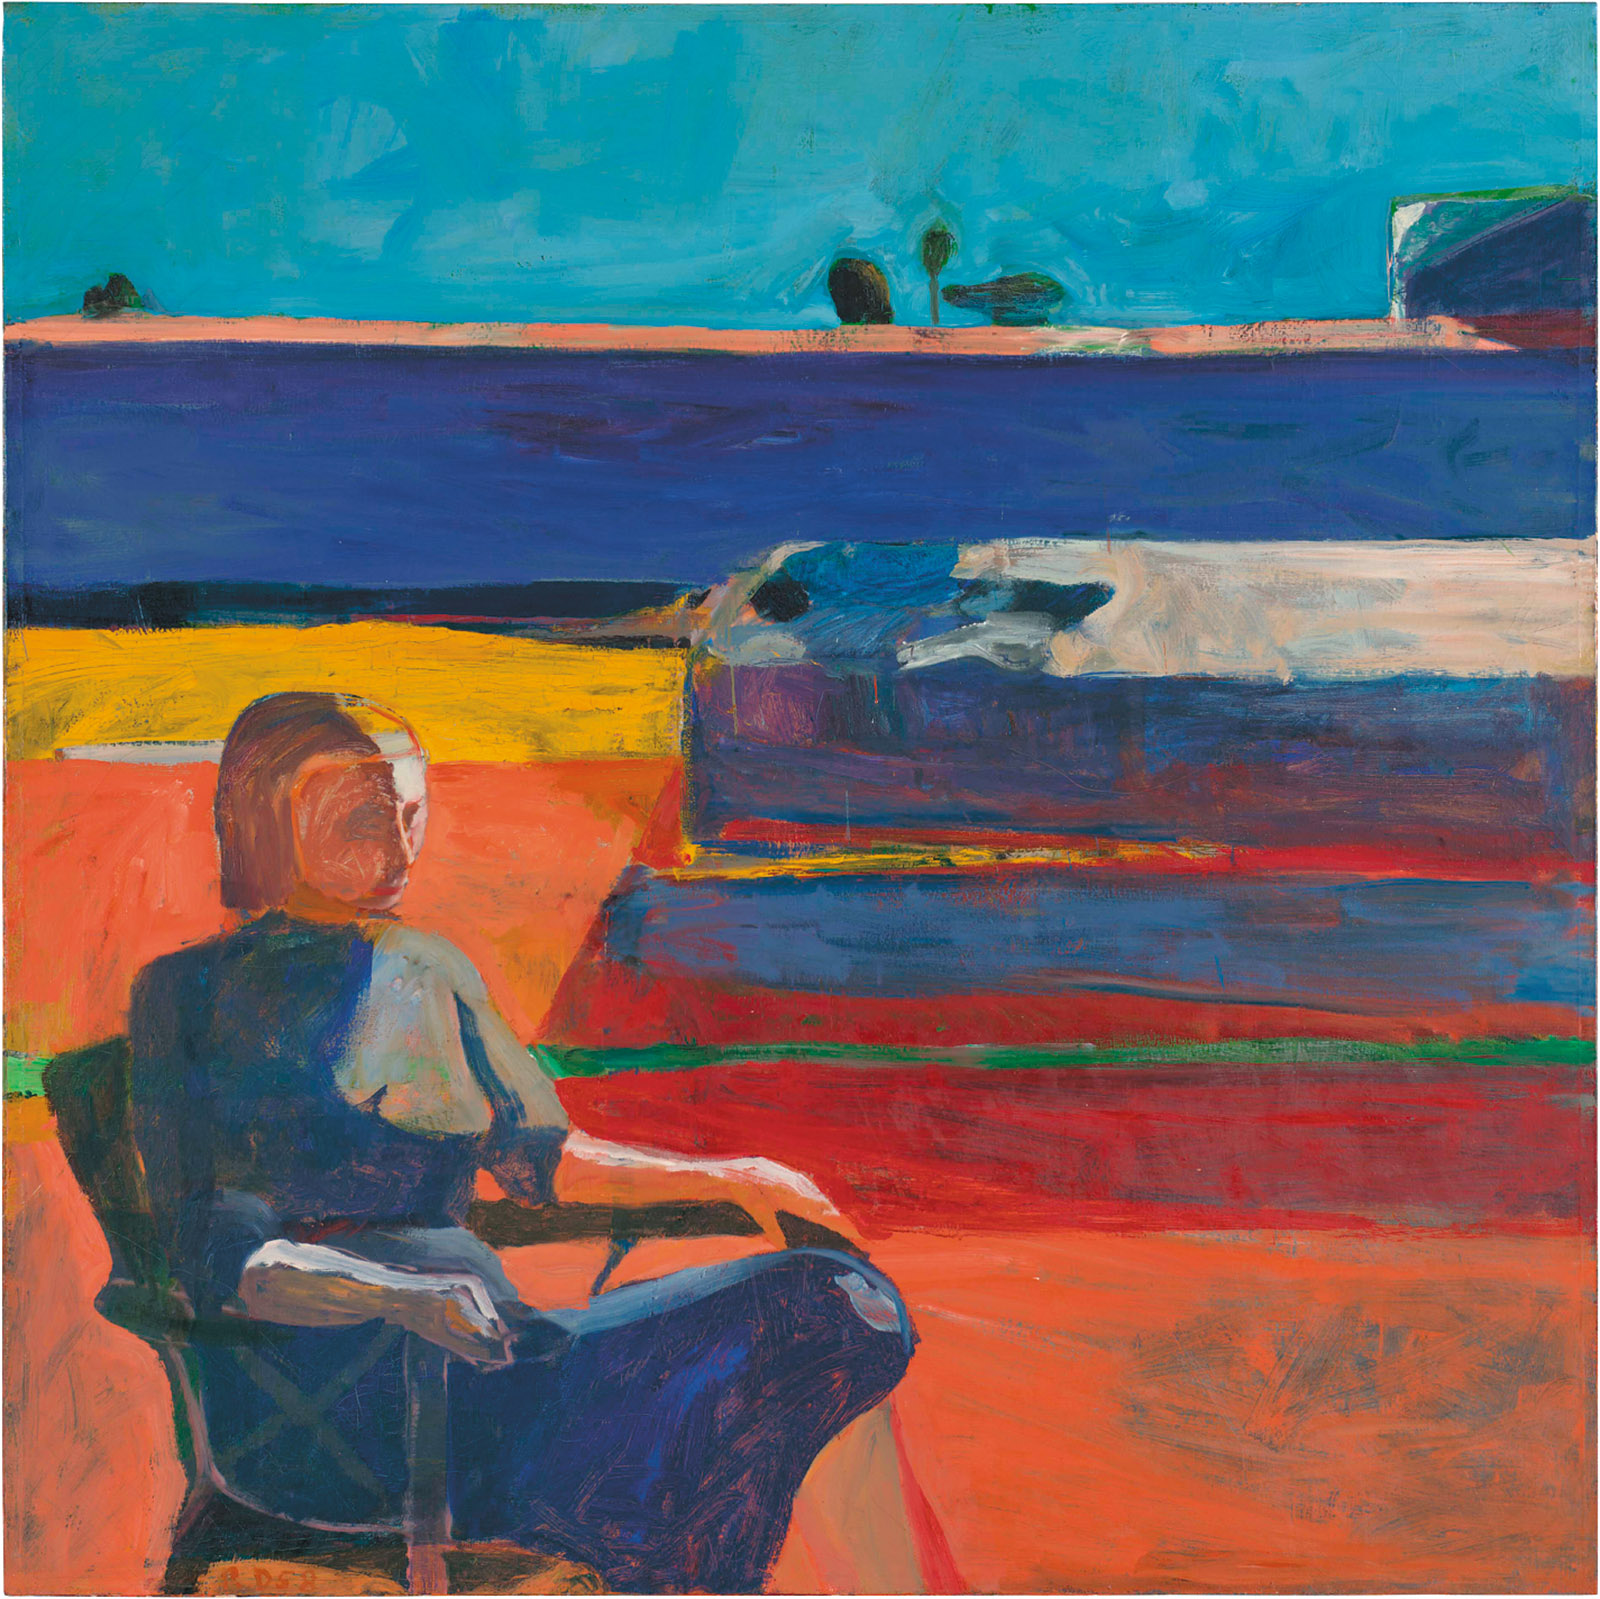 Richard Diebenkorn: Woman on a Porch, 72 x 72 inches, 1958